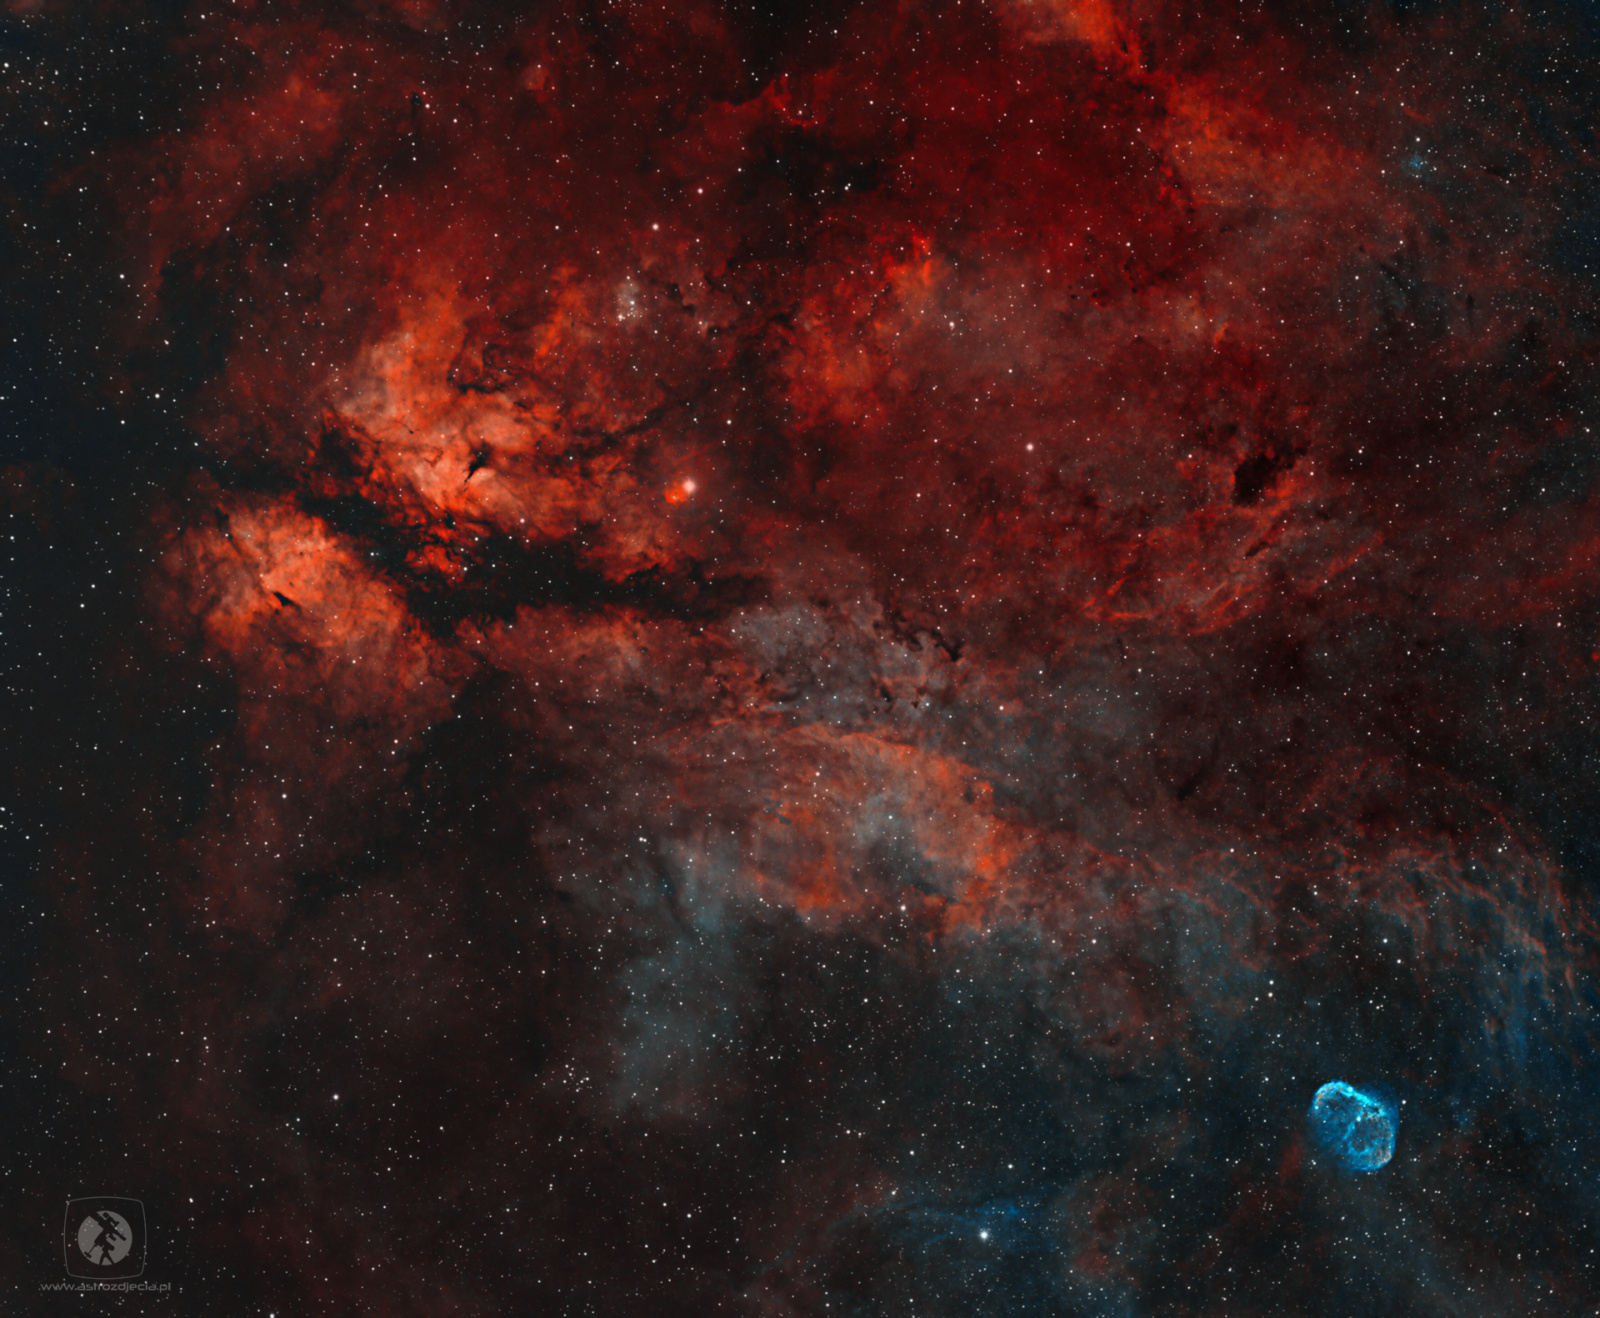 IC1318-HOO.thumb.jpg.3f4cf288902266a29de6cd980ac3d8db.jpg